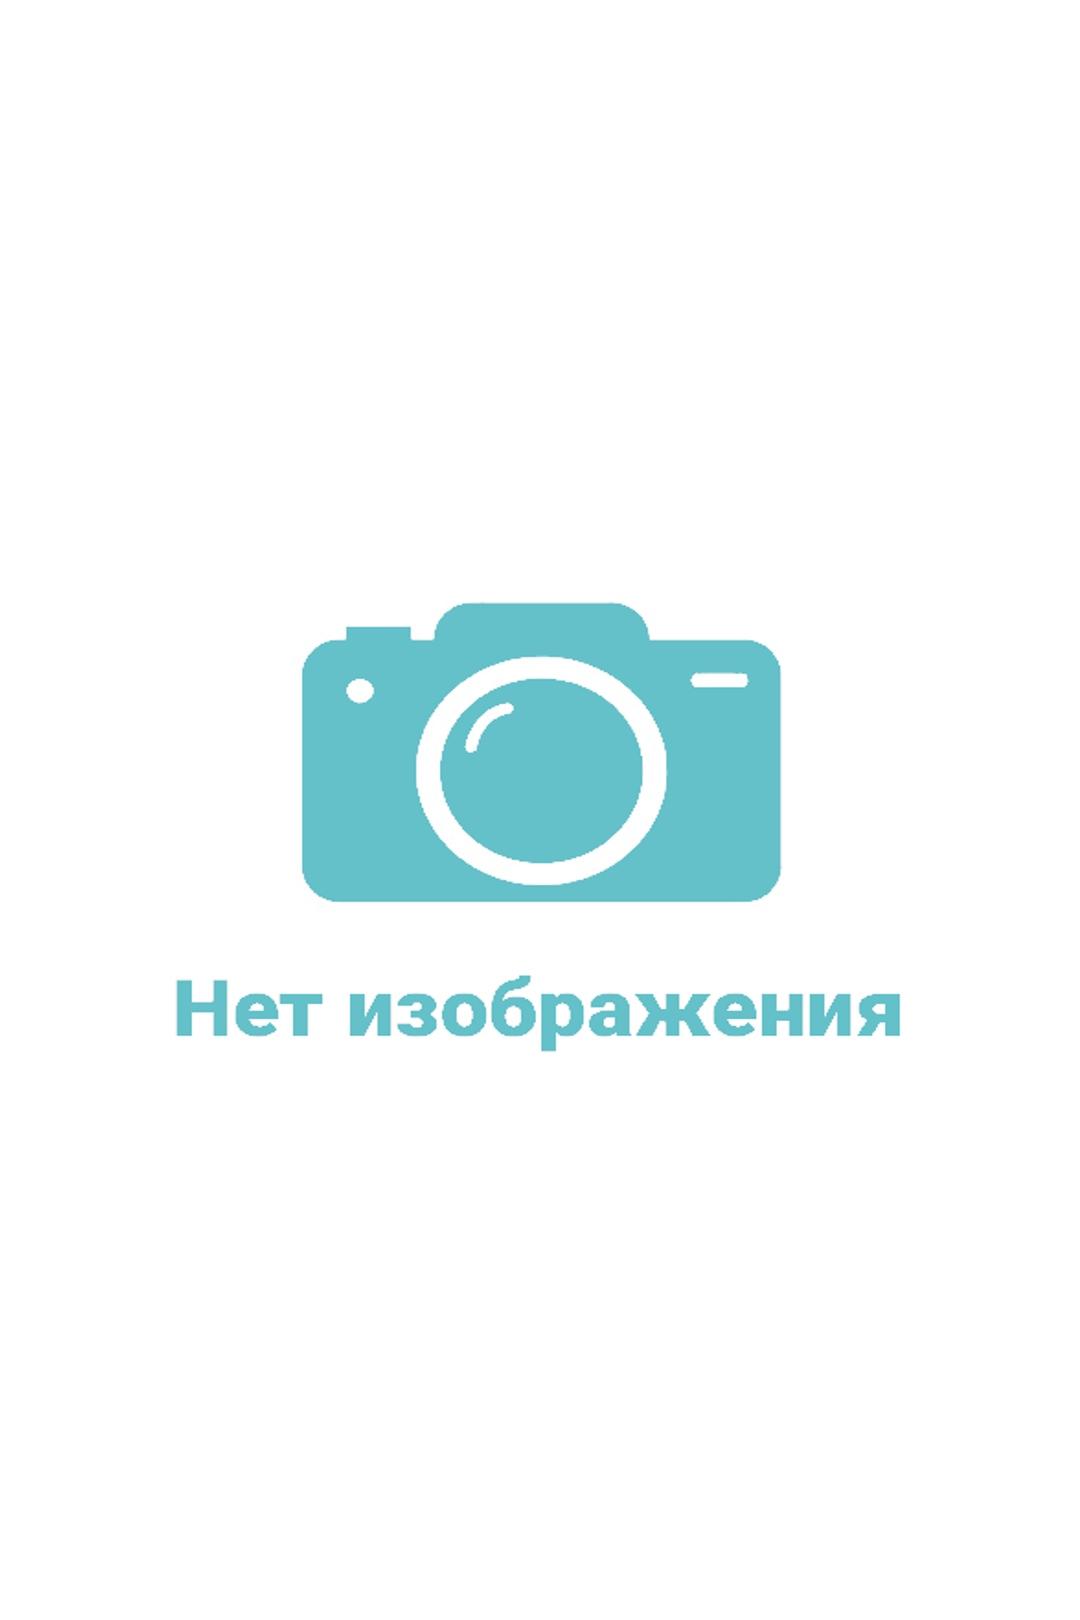 Врач онколог Симаков Андрей Евгеньевич